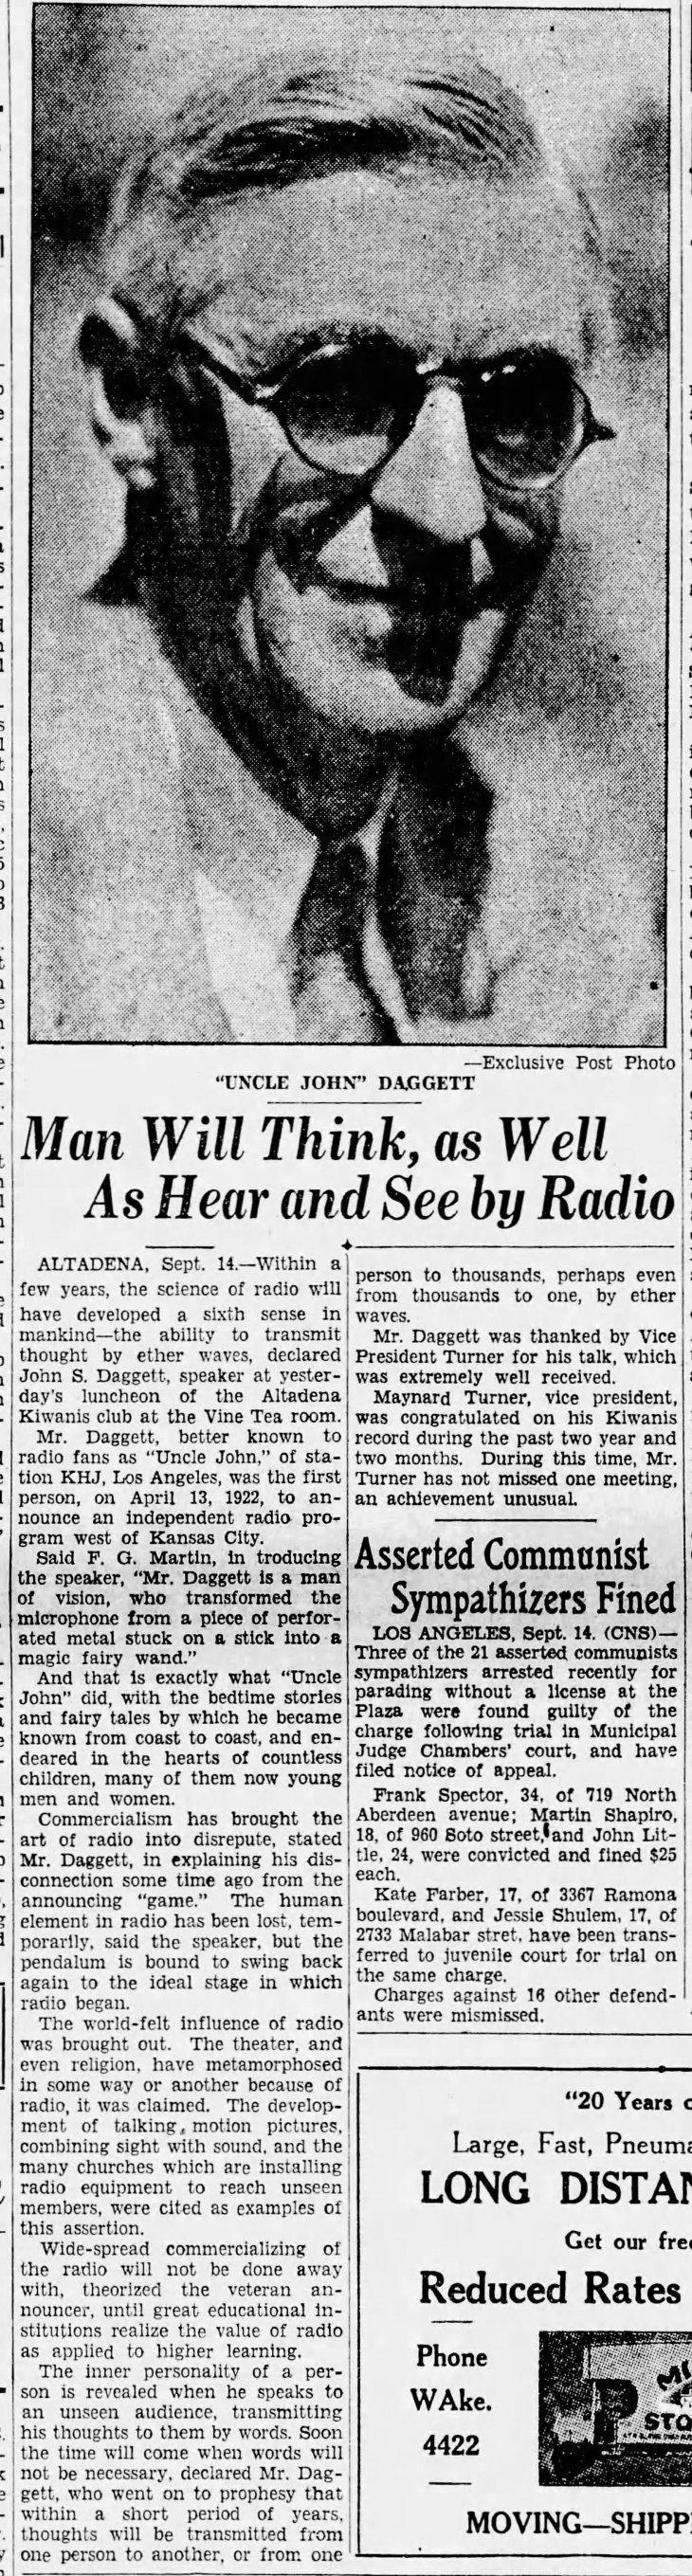 Daggett speech on radio The_Pasadena_Post_Sat__Sep_14__1929_